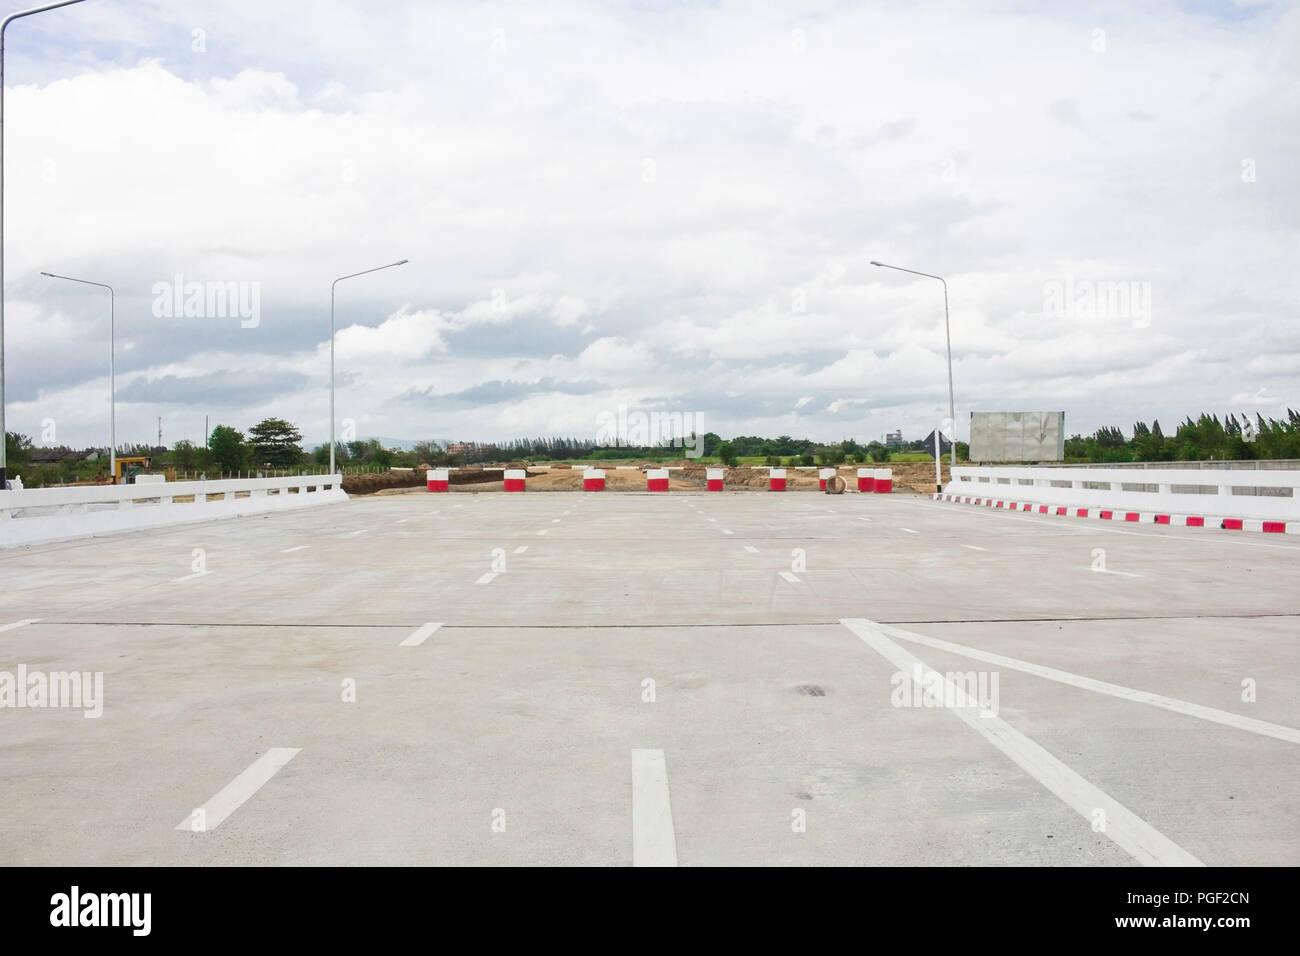 Worn Road Closed barricade blocks road construction site - Stock Image